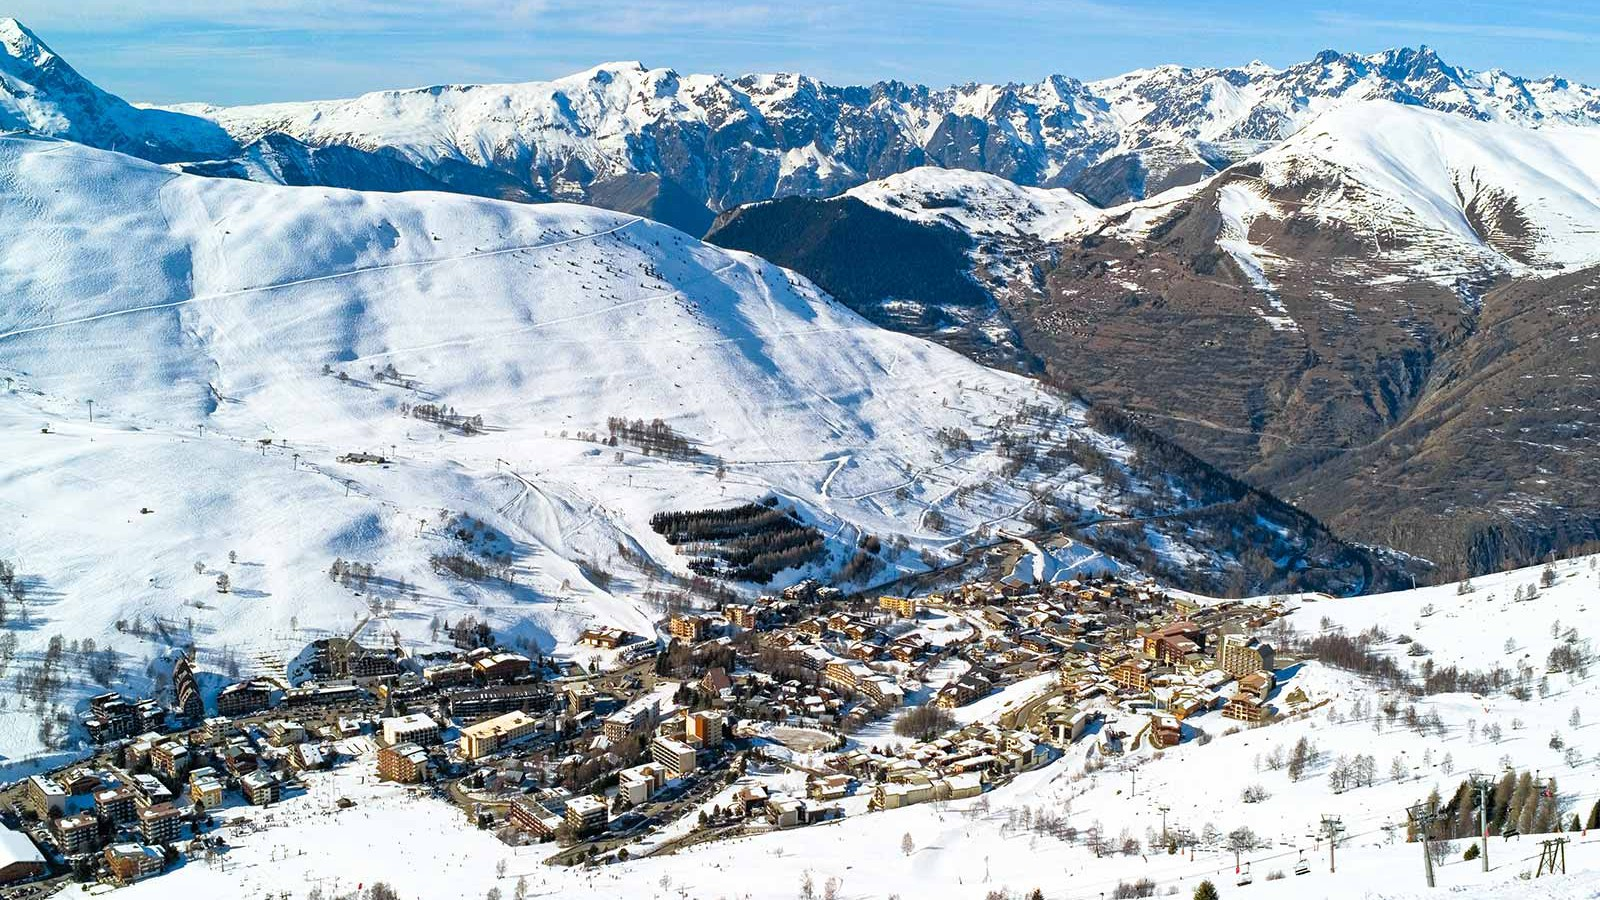 Hotel Club Les Panorama, Les Deux Alpes - Resort